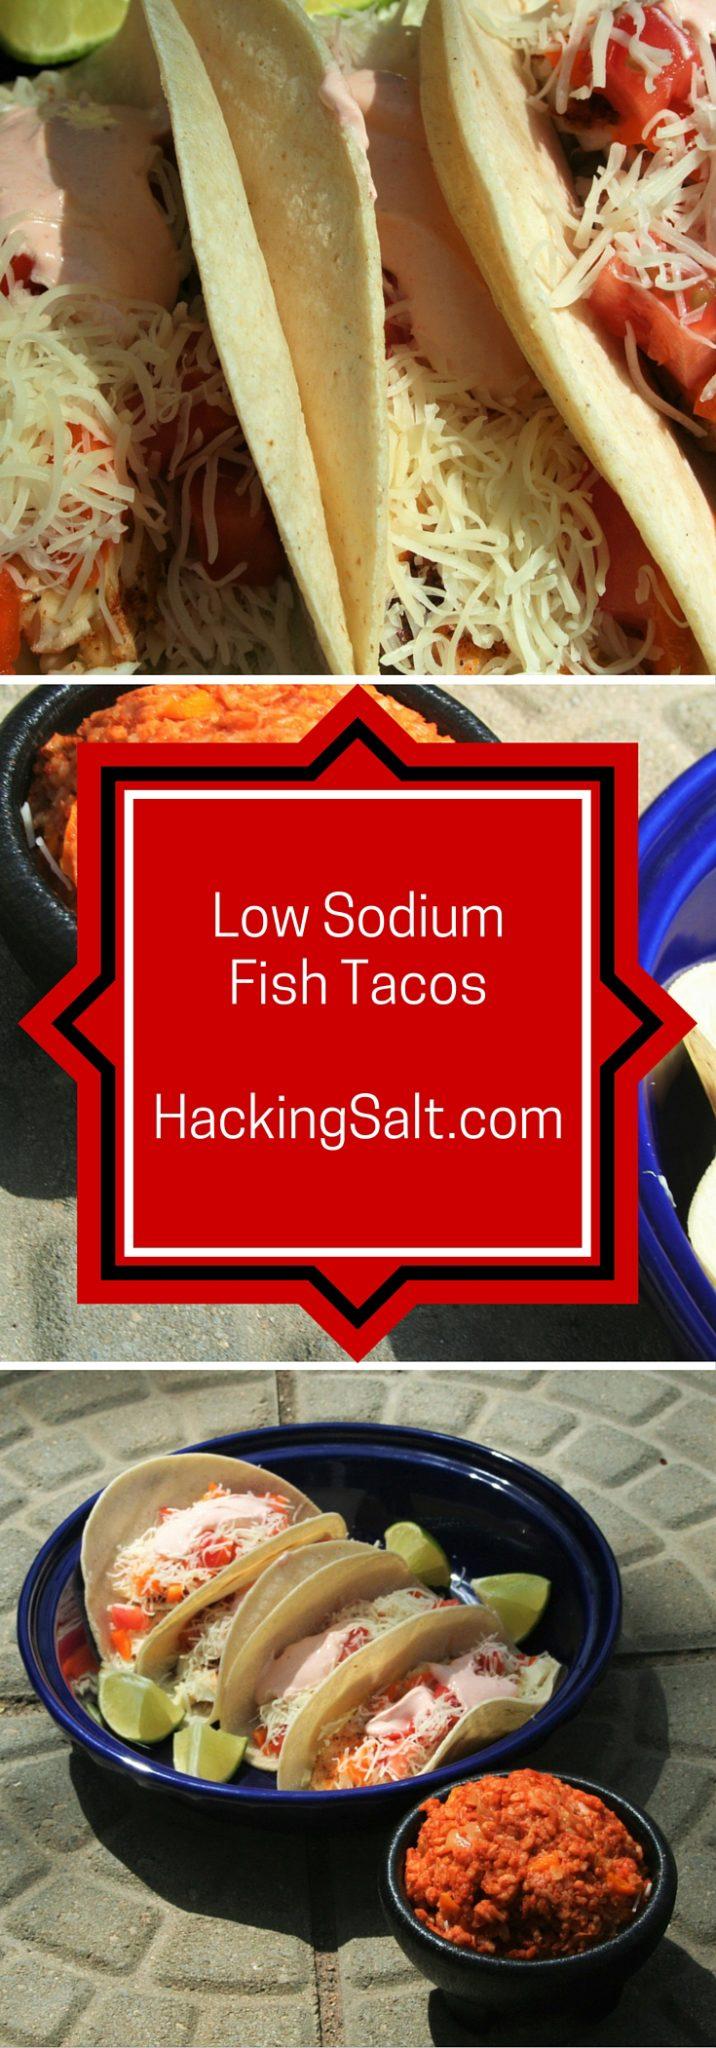 Low Sodium Blackened Fish Tacos